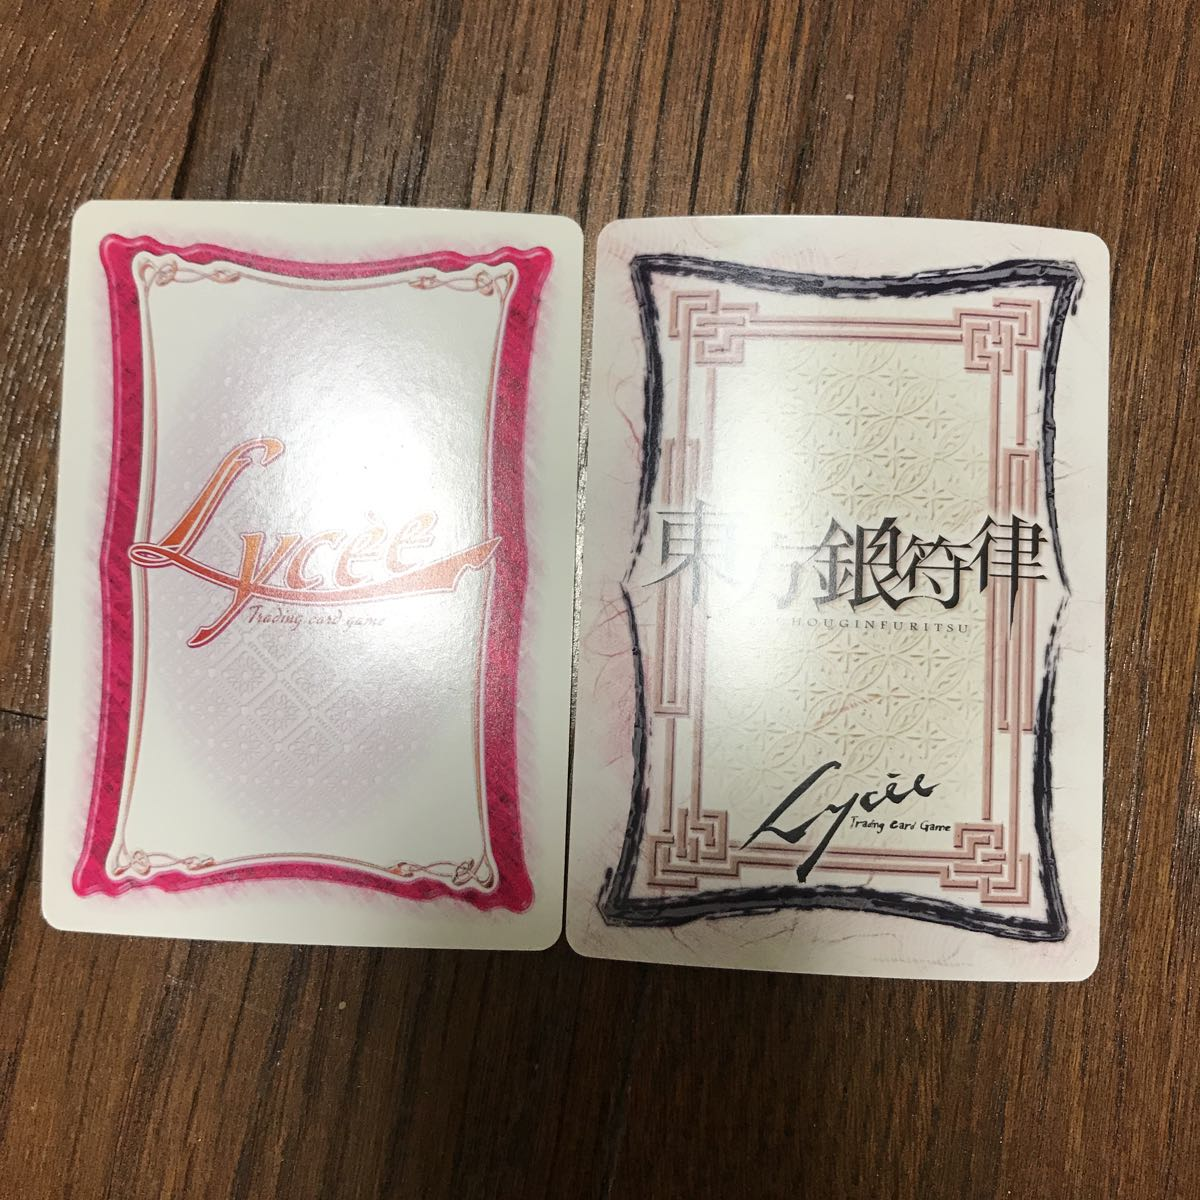 lycee リセ カード トレカ 大量 約2000枚_画像3